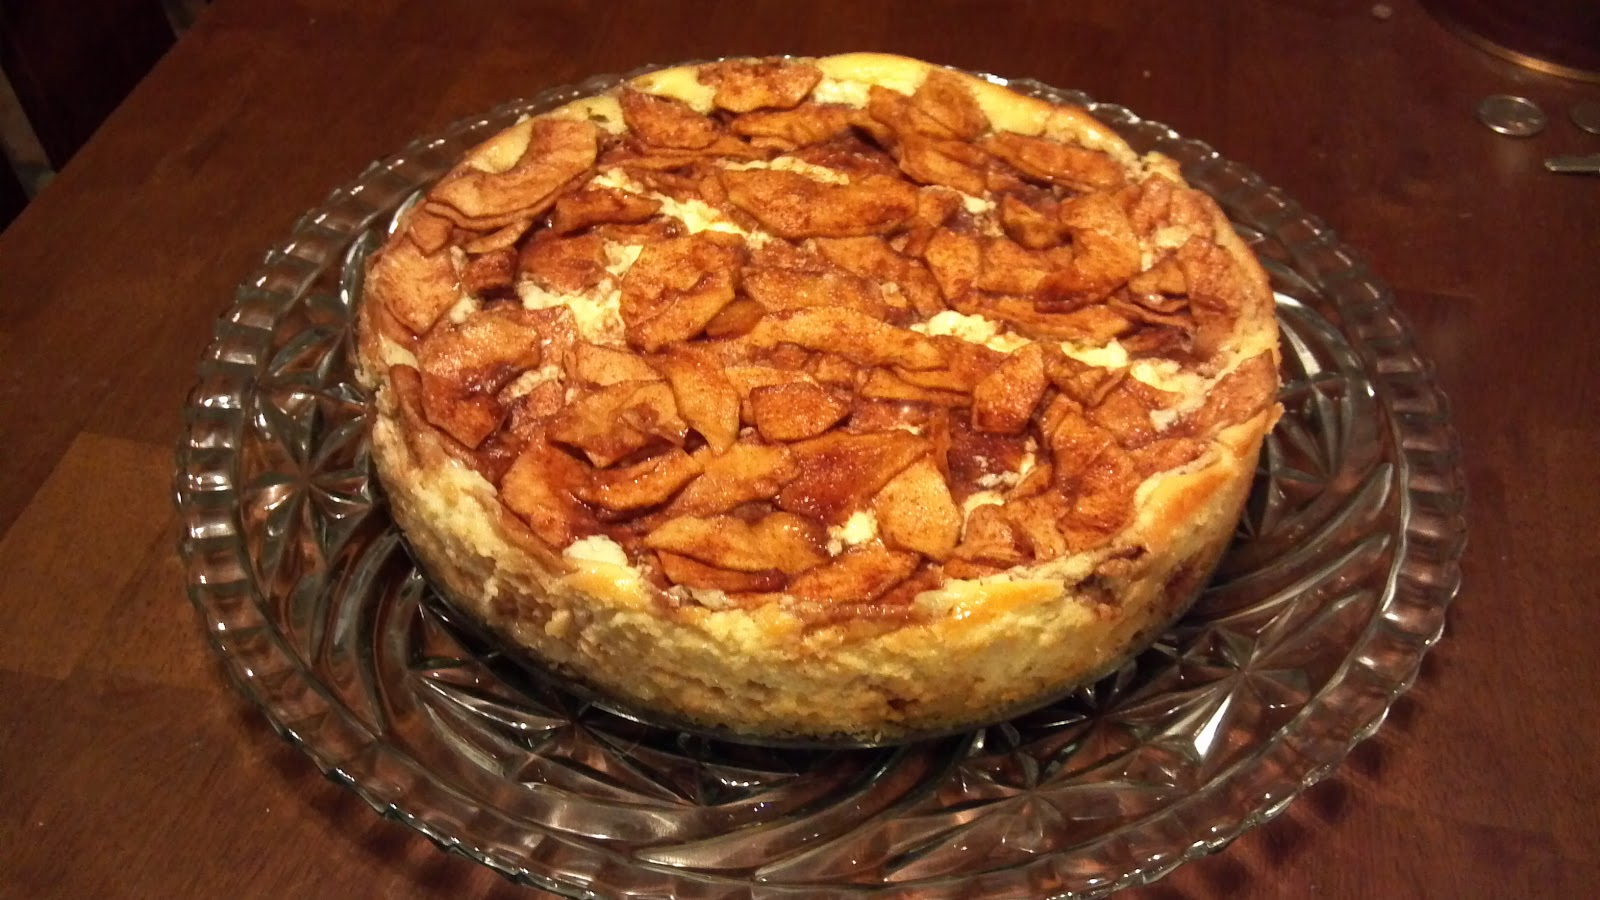 ... Memories & Merriment with Marna: Bob's Favorite Bavarian Apple Torte